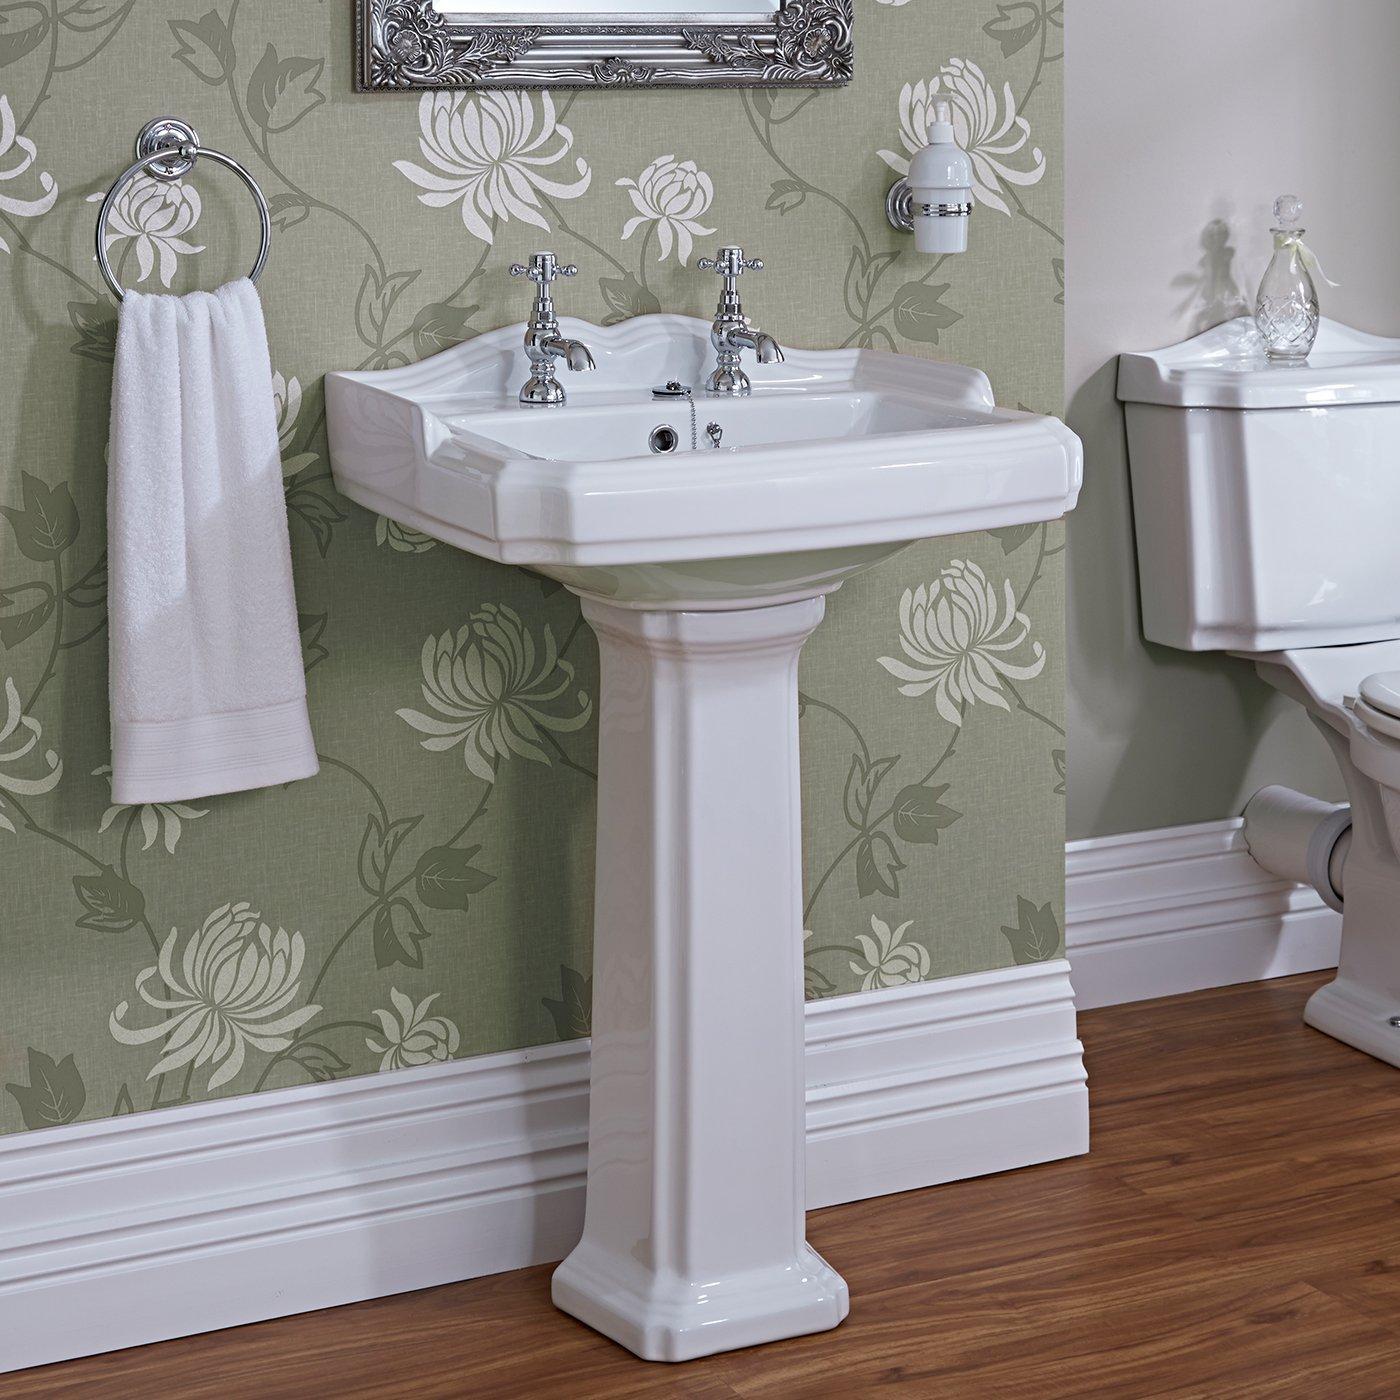 Home Standard Fitzwilliam Traditional Bathroom 1 Tap Hole Sink Wash Basin & Full Floorstanding Pedestal